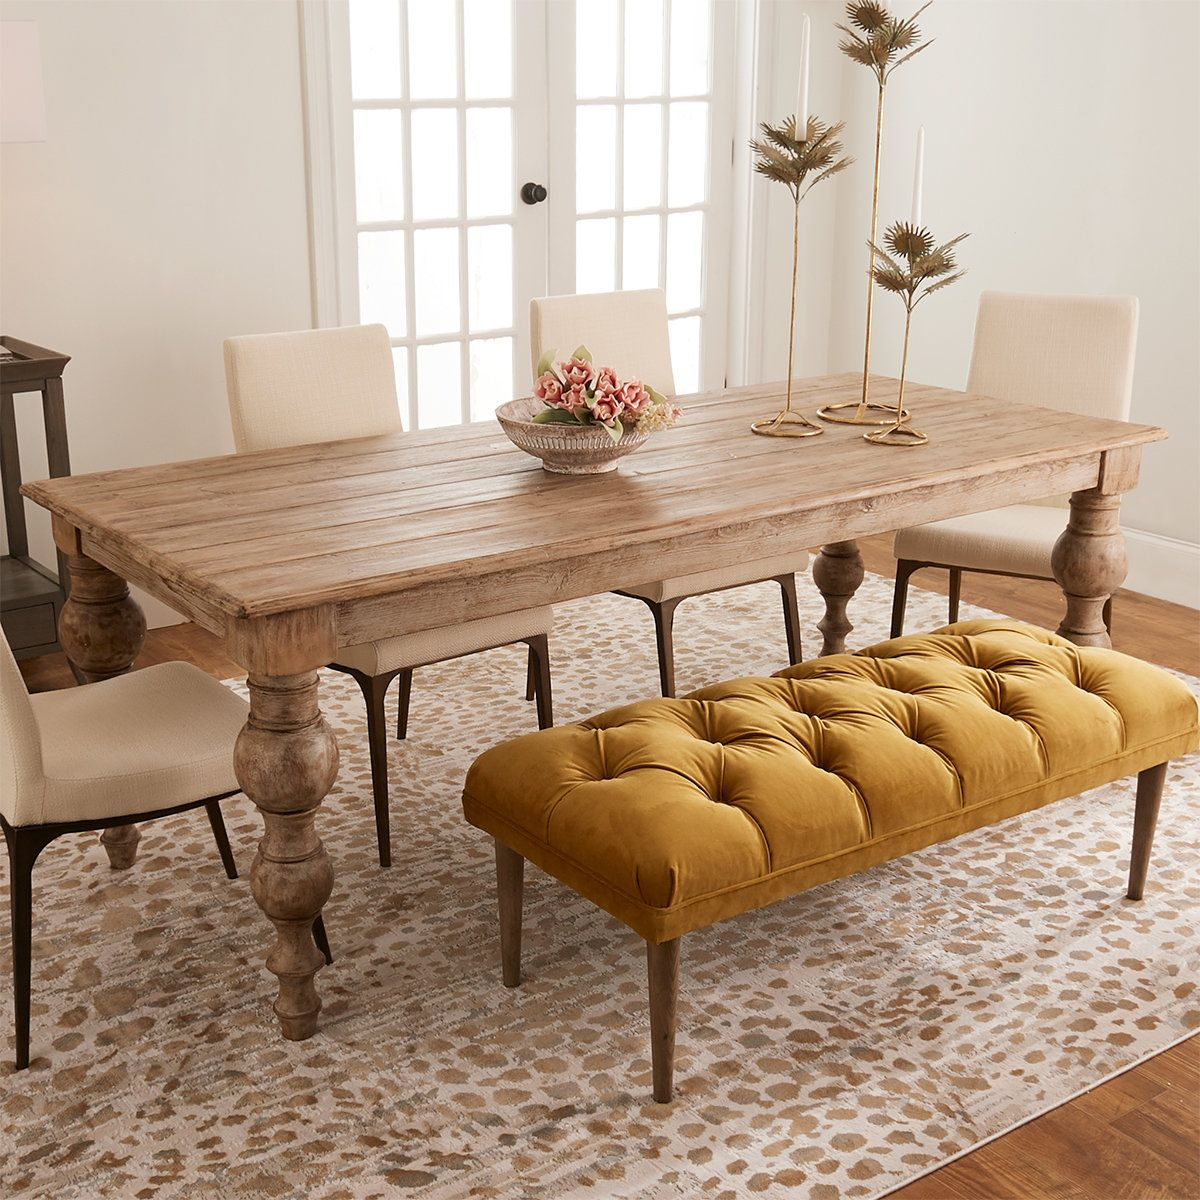 Knurled Knobs Dining Table